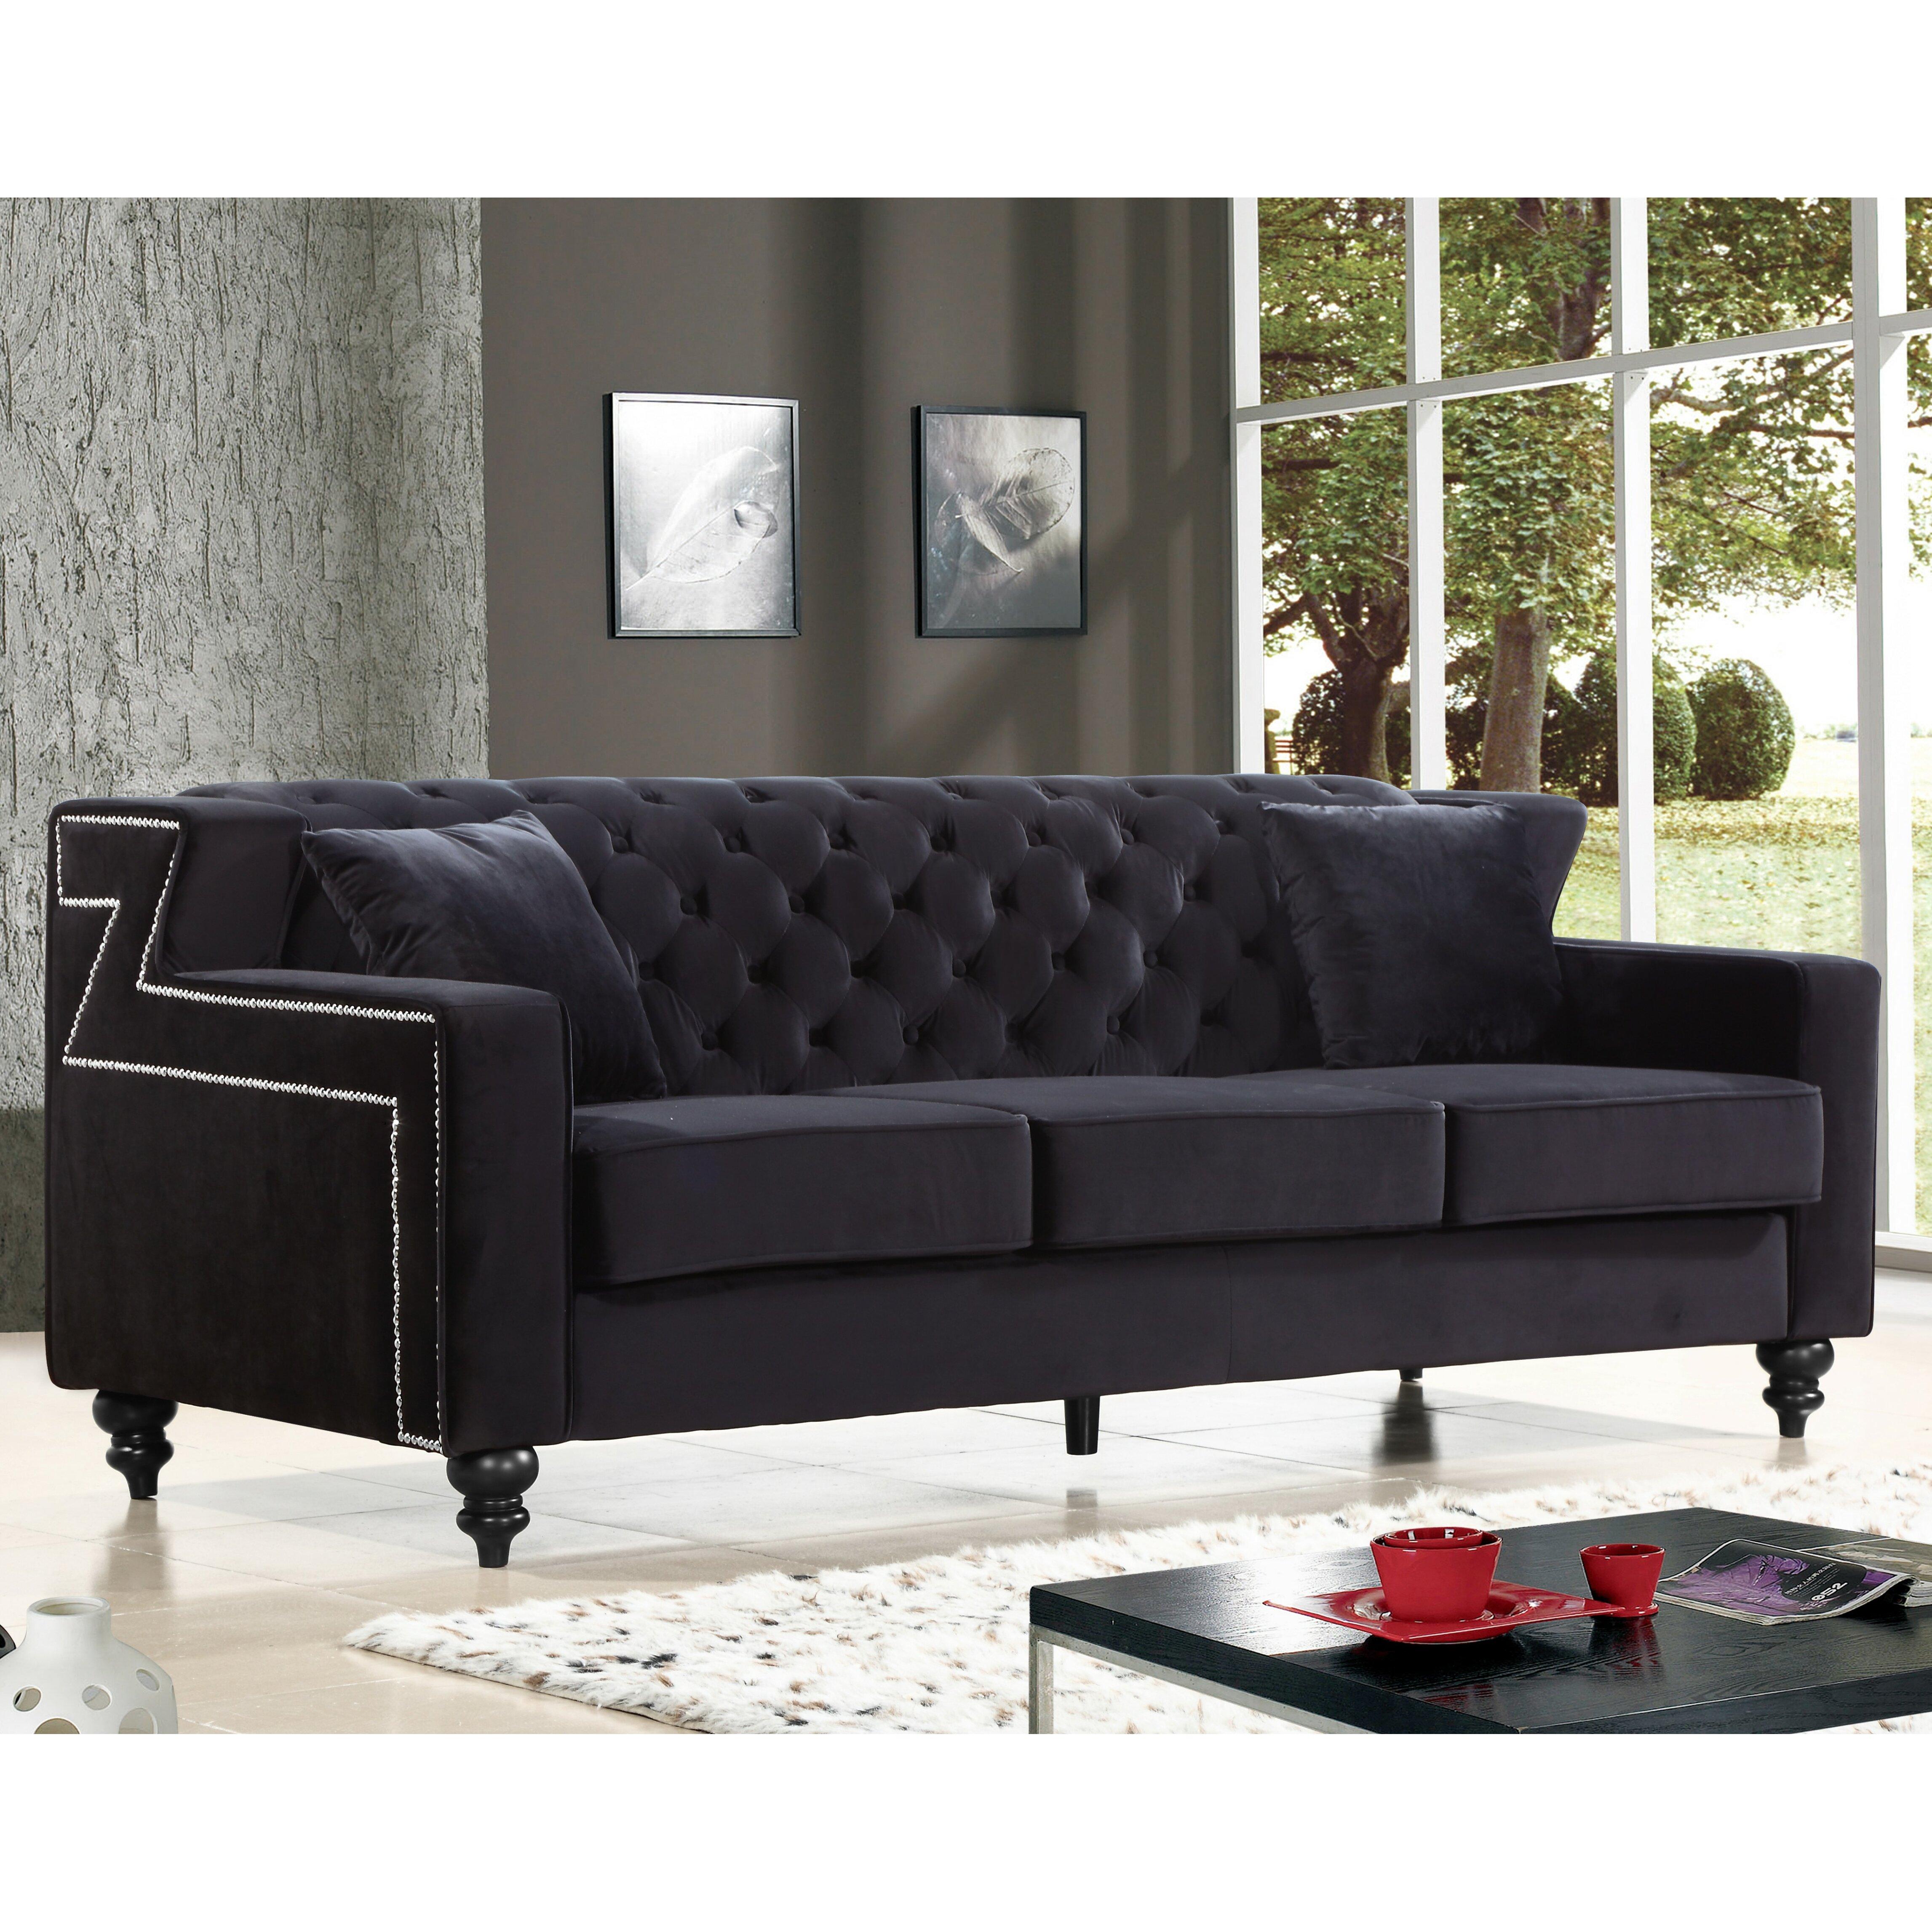 Meridian furniture usa harley sofa reviews for Divan furniture usa